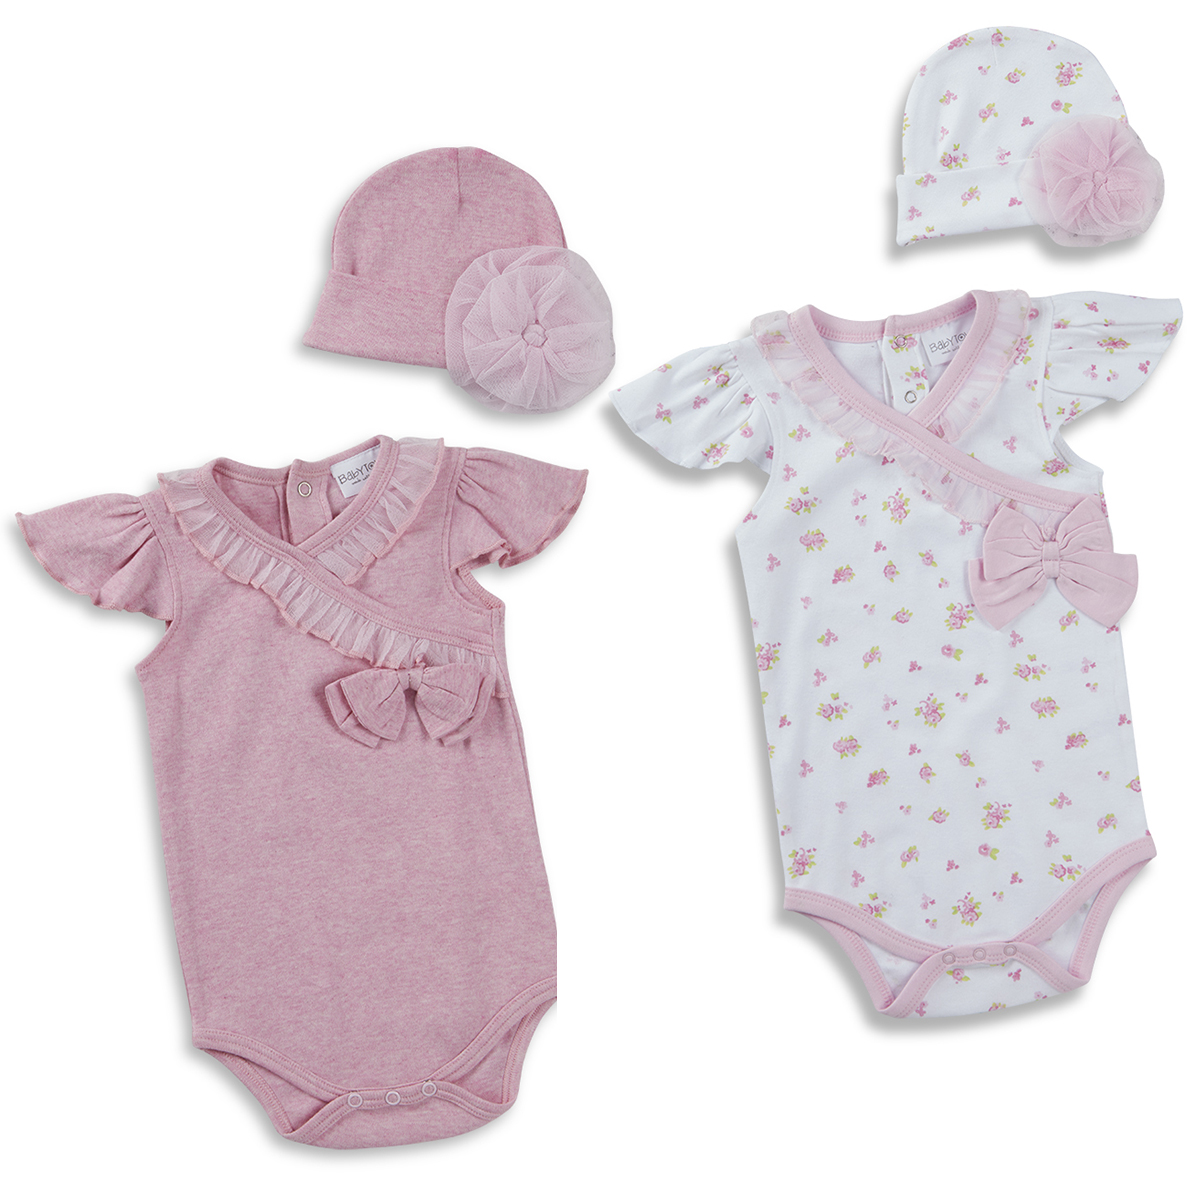 Baby Prem Girls Boys Sleepsuit Bib Hat Babygrow Reborn Gift Set Romper Bodysuit